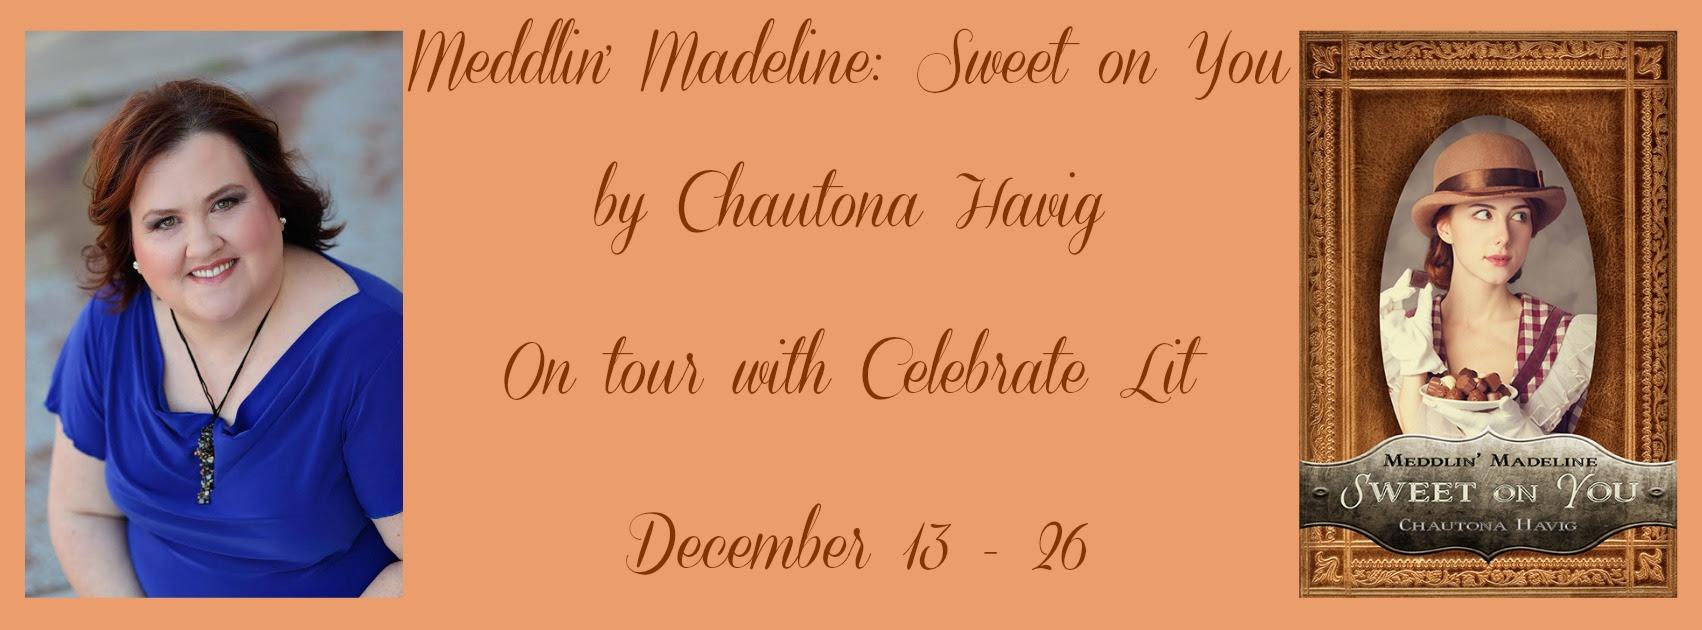 madeline-fb-banner